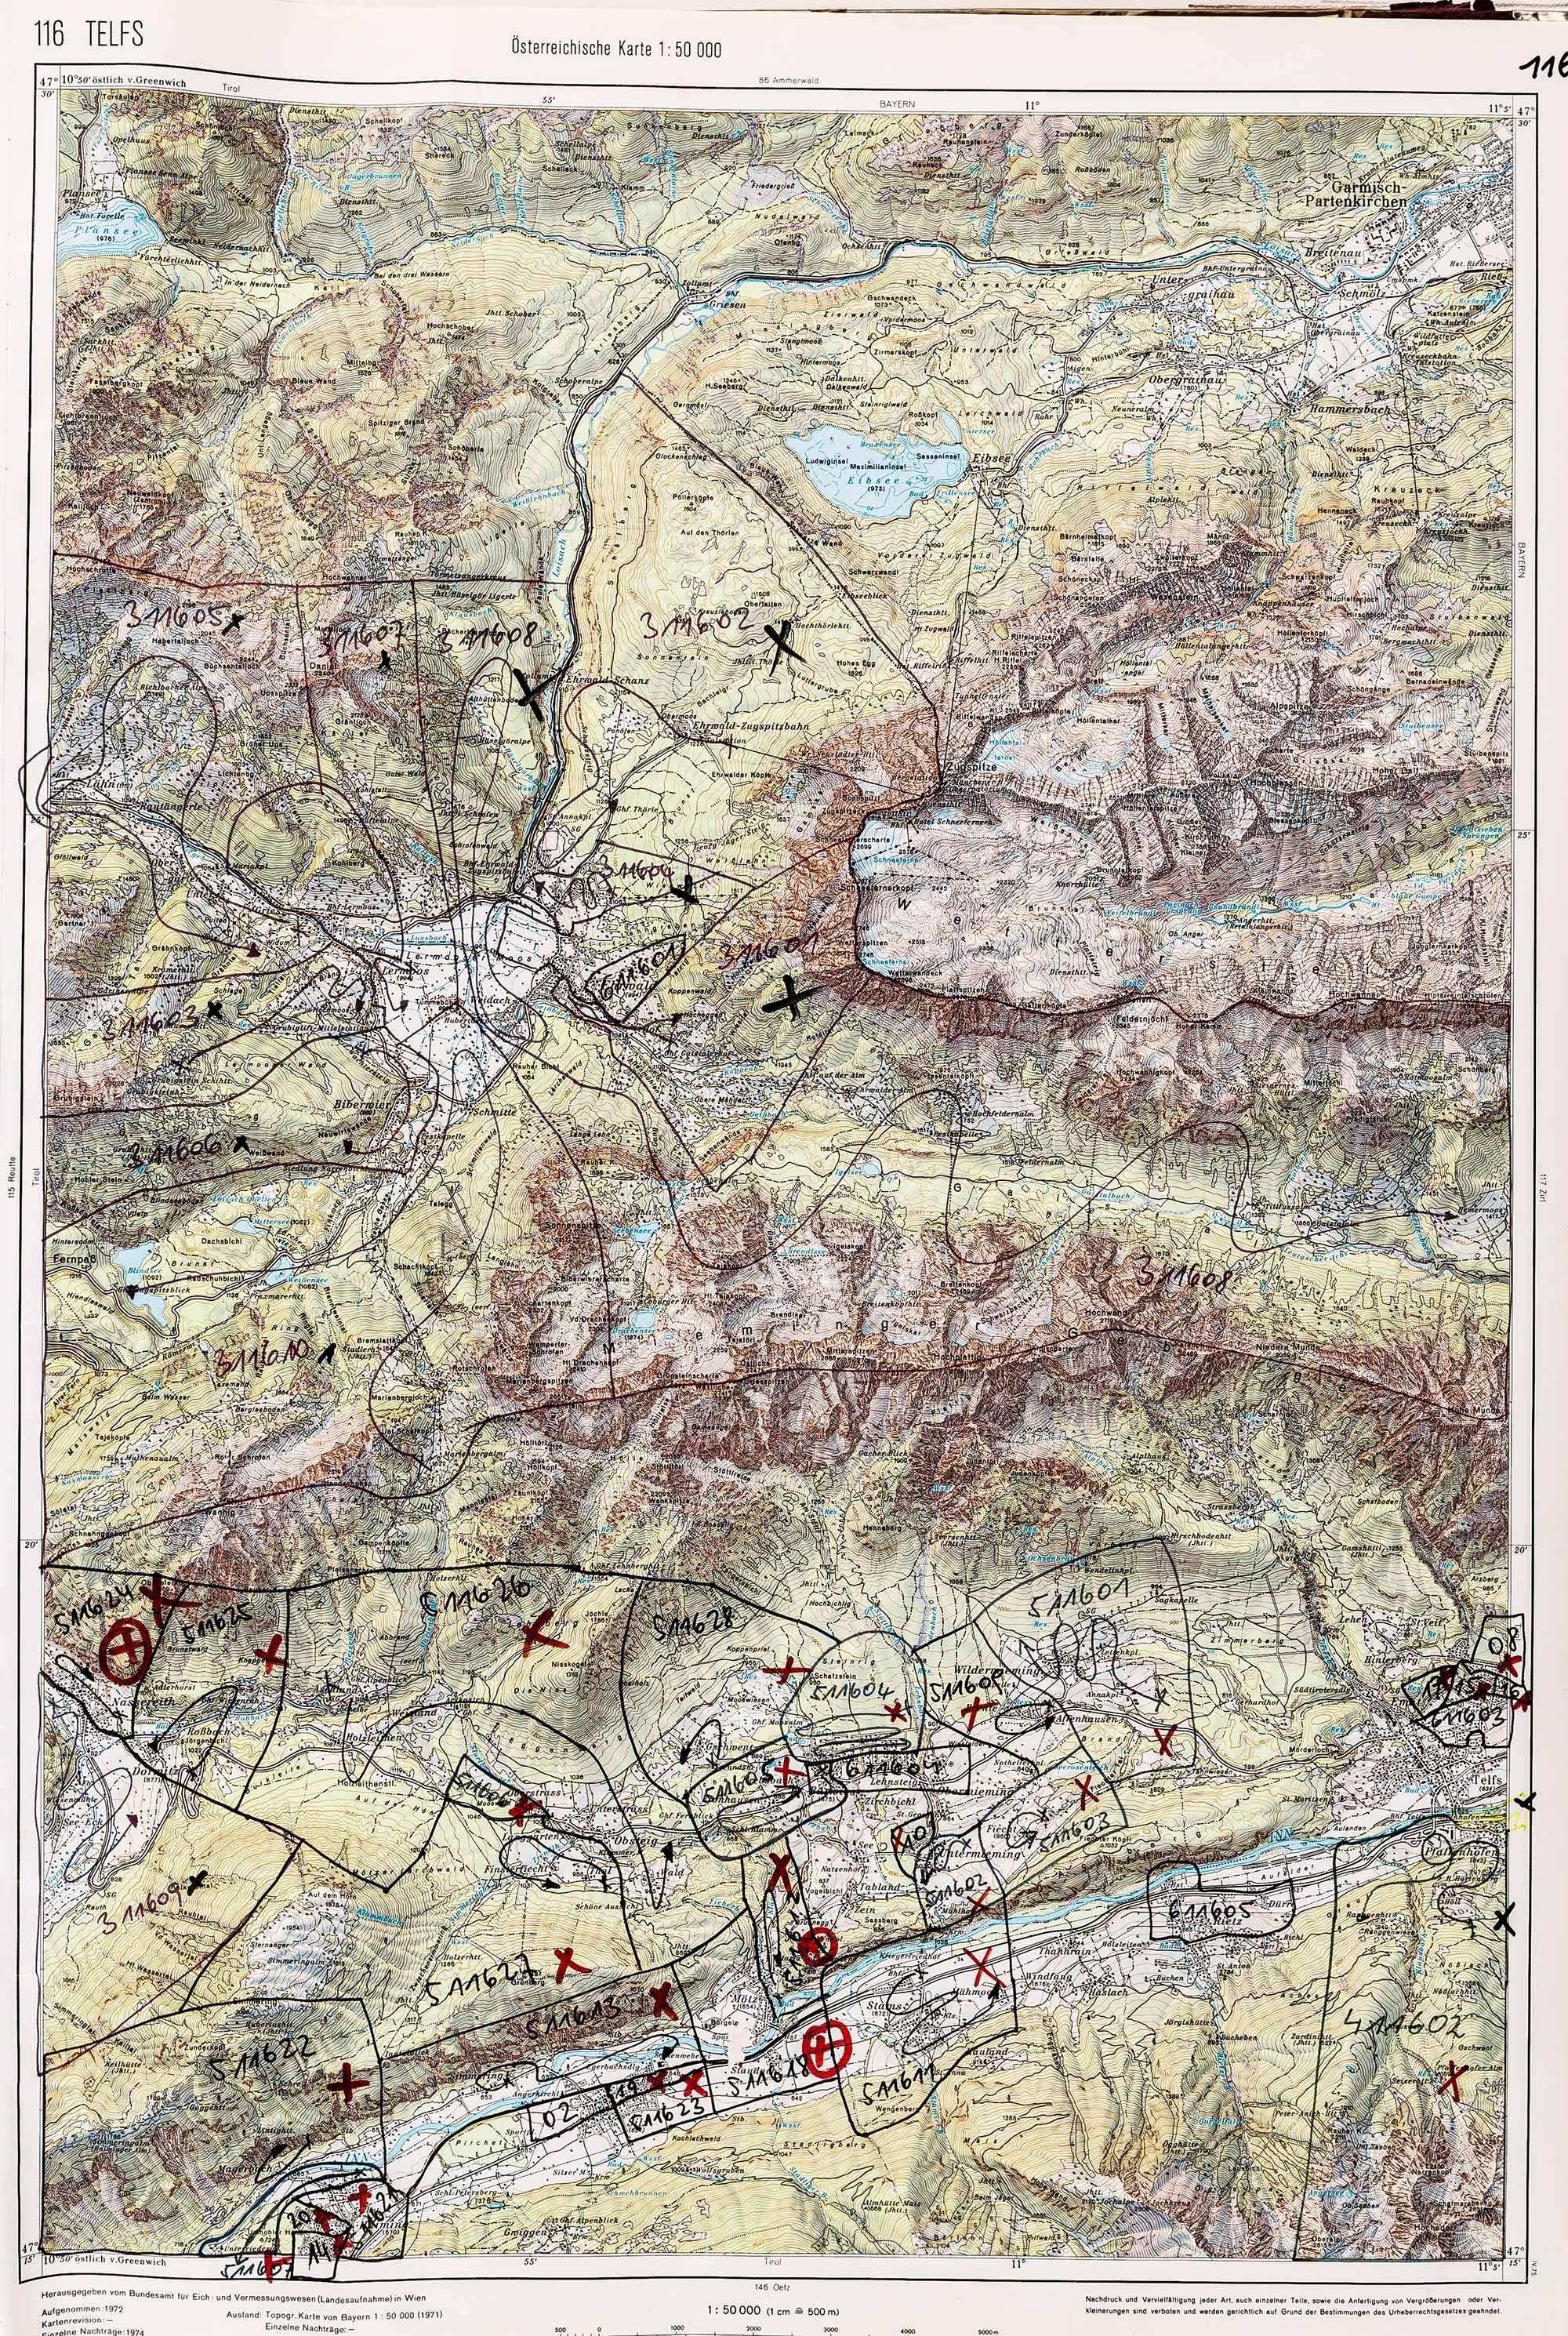 1983-1986 Karte 116